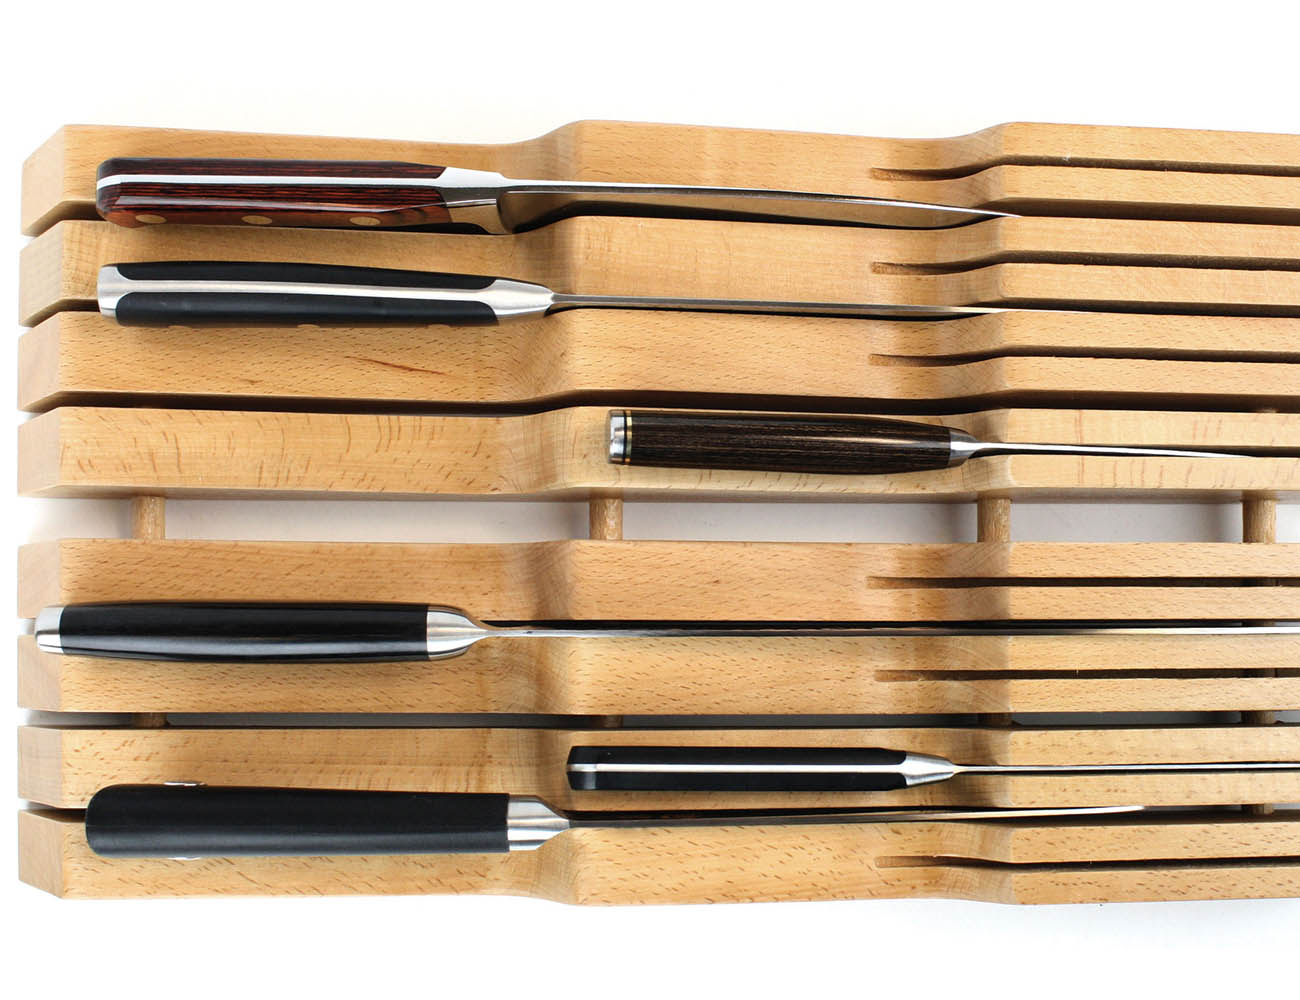 In-Drawer Knife Block by Wusthof